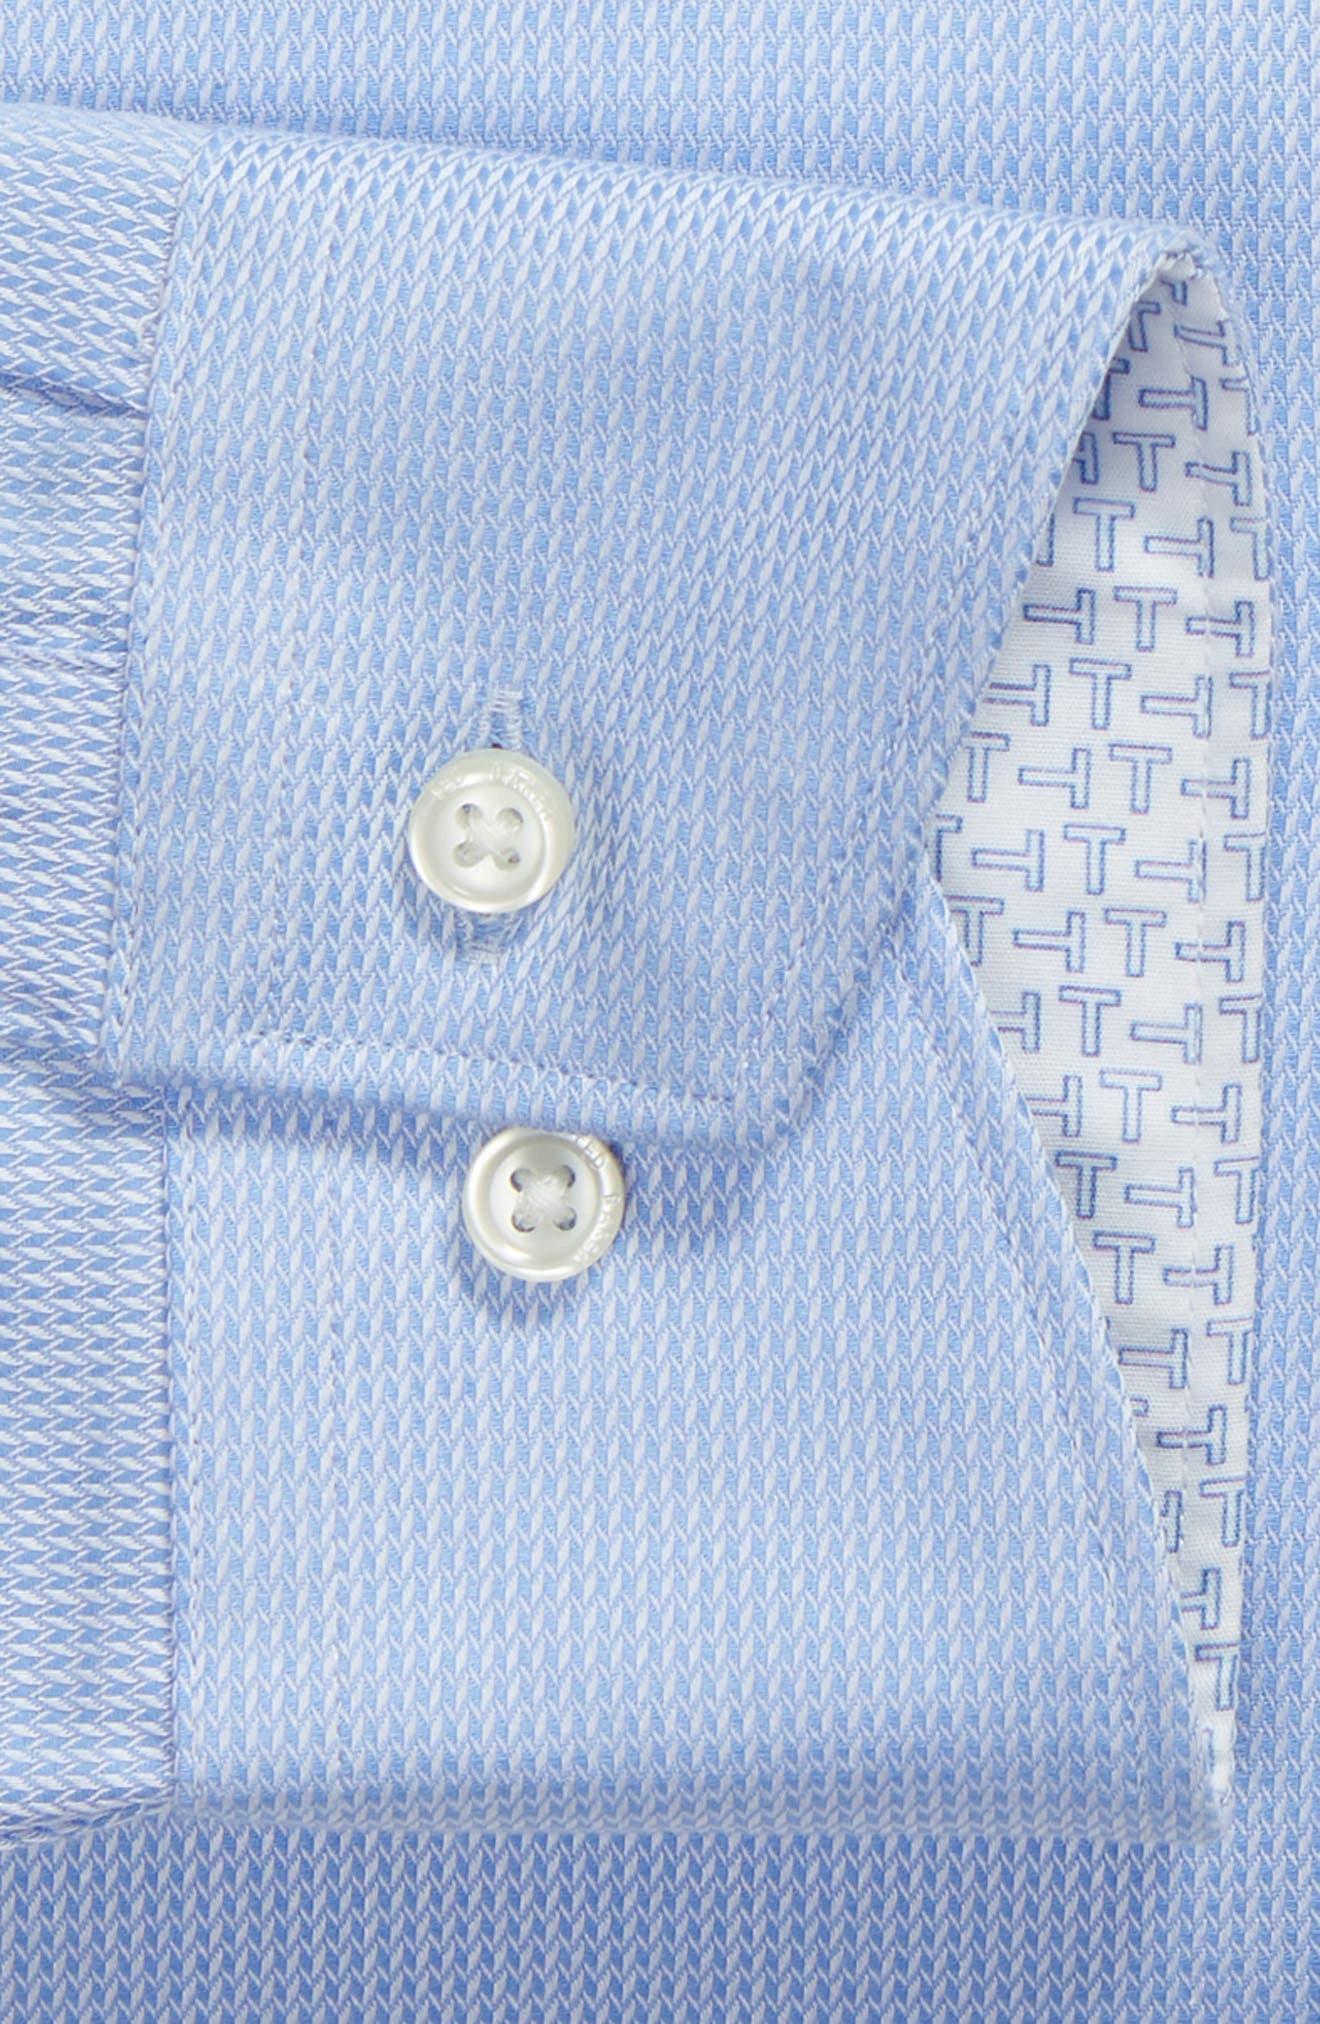 Trim Fit Stretch Performance Dress Shirt,                             Alternate thumbnail 6, color,                             BLUE